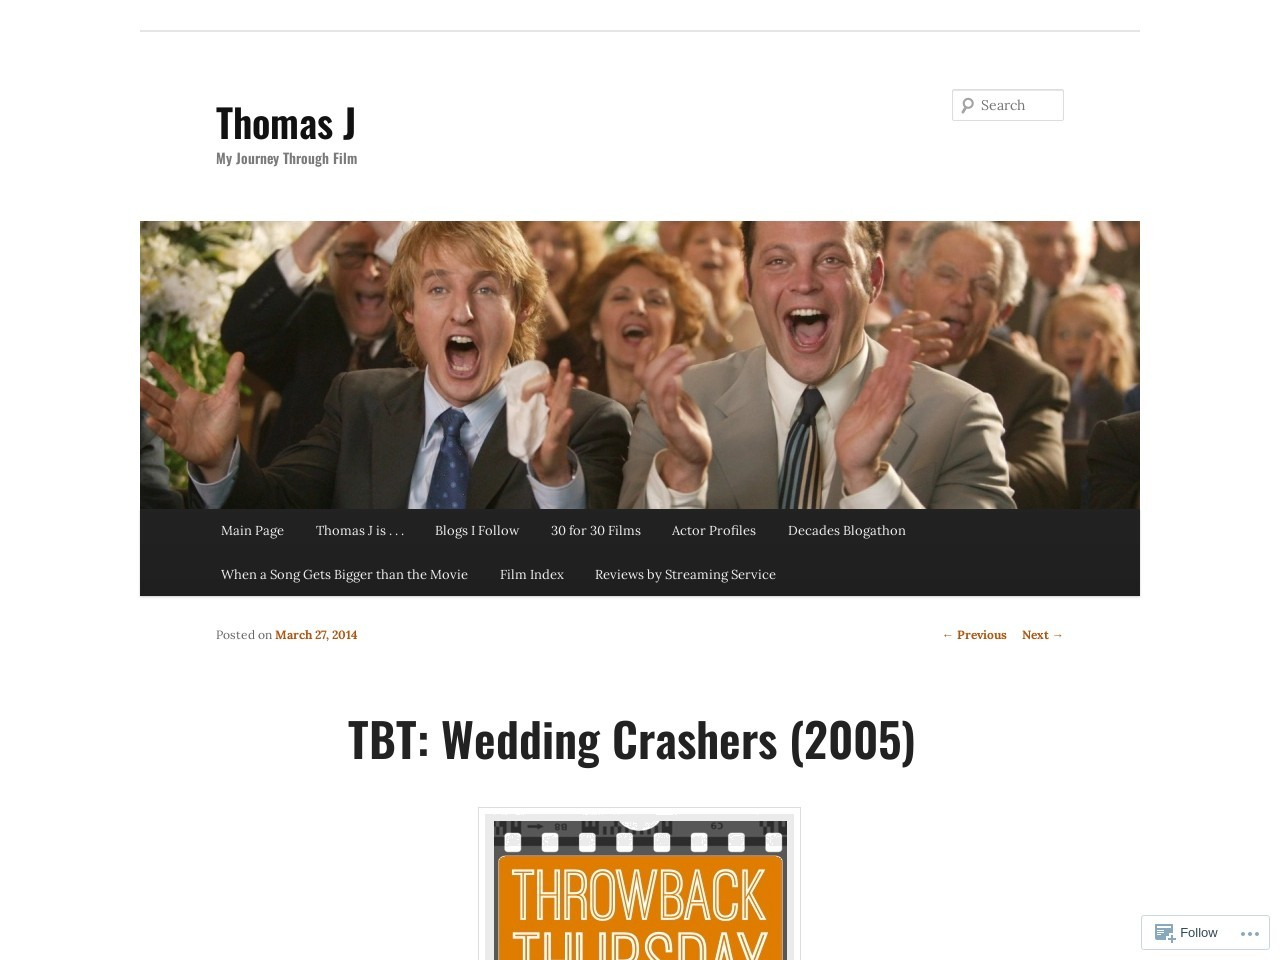 TBT: Wedding Crashers (2005) | digitalshortbread